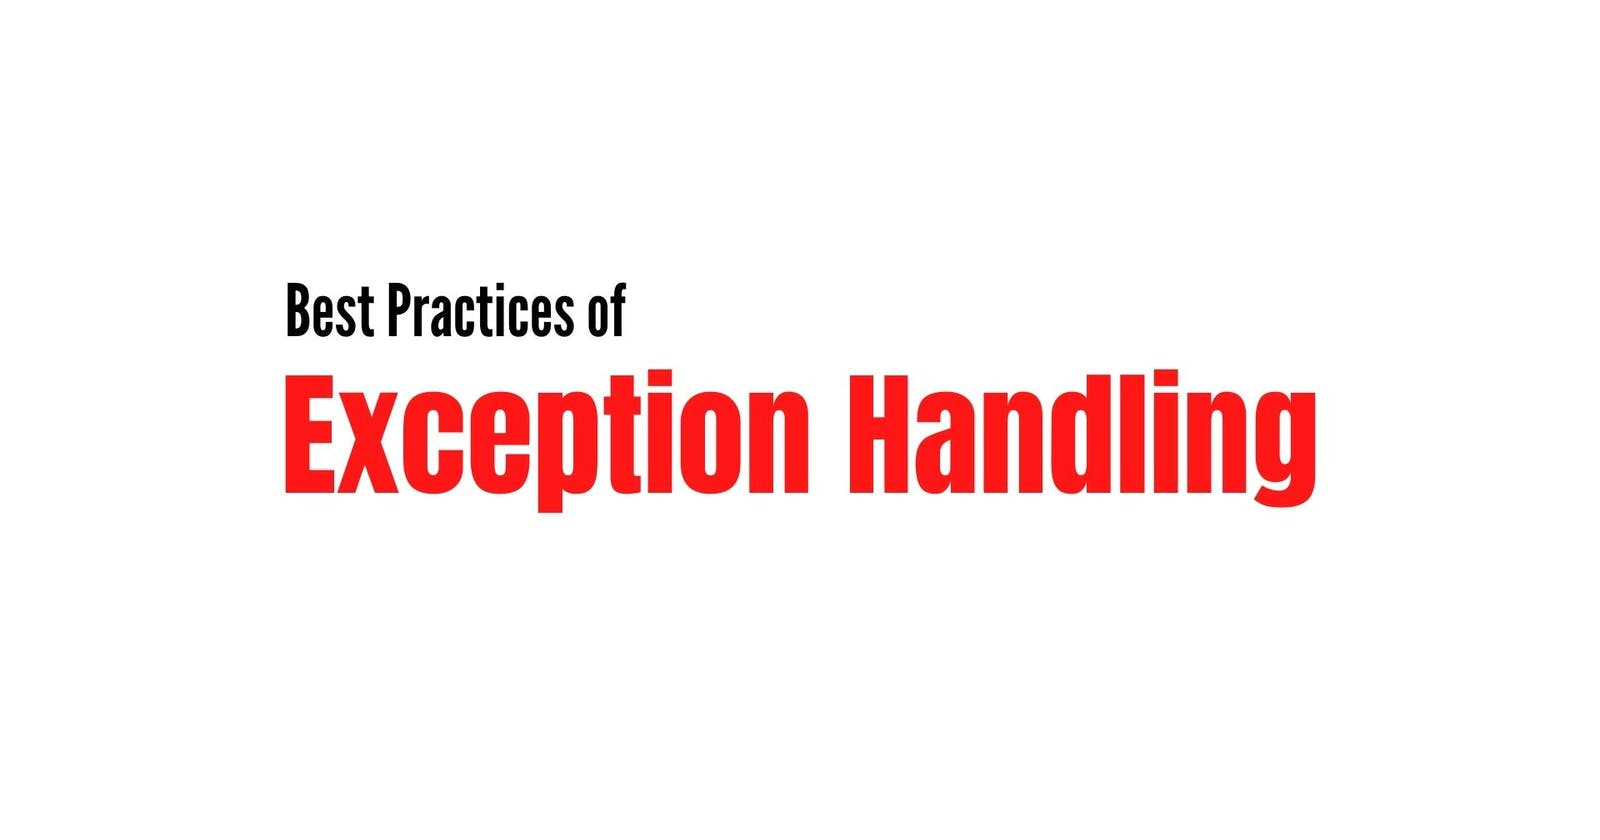 Best Practices of Exception Handling